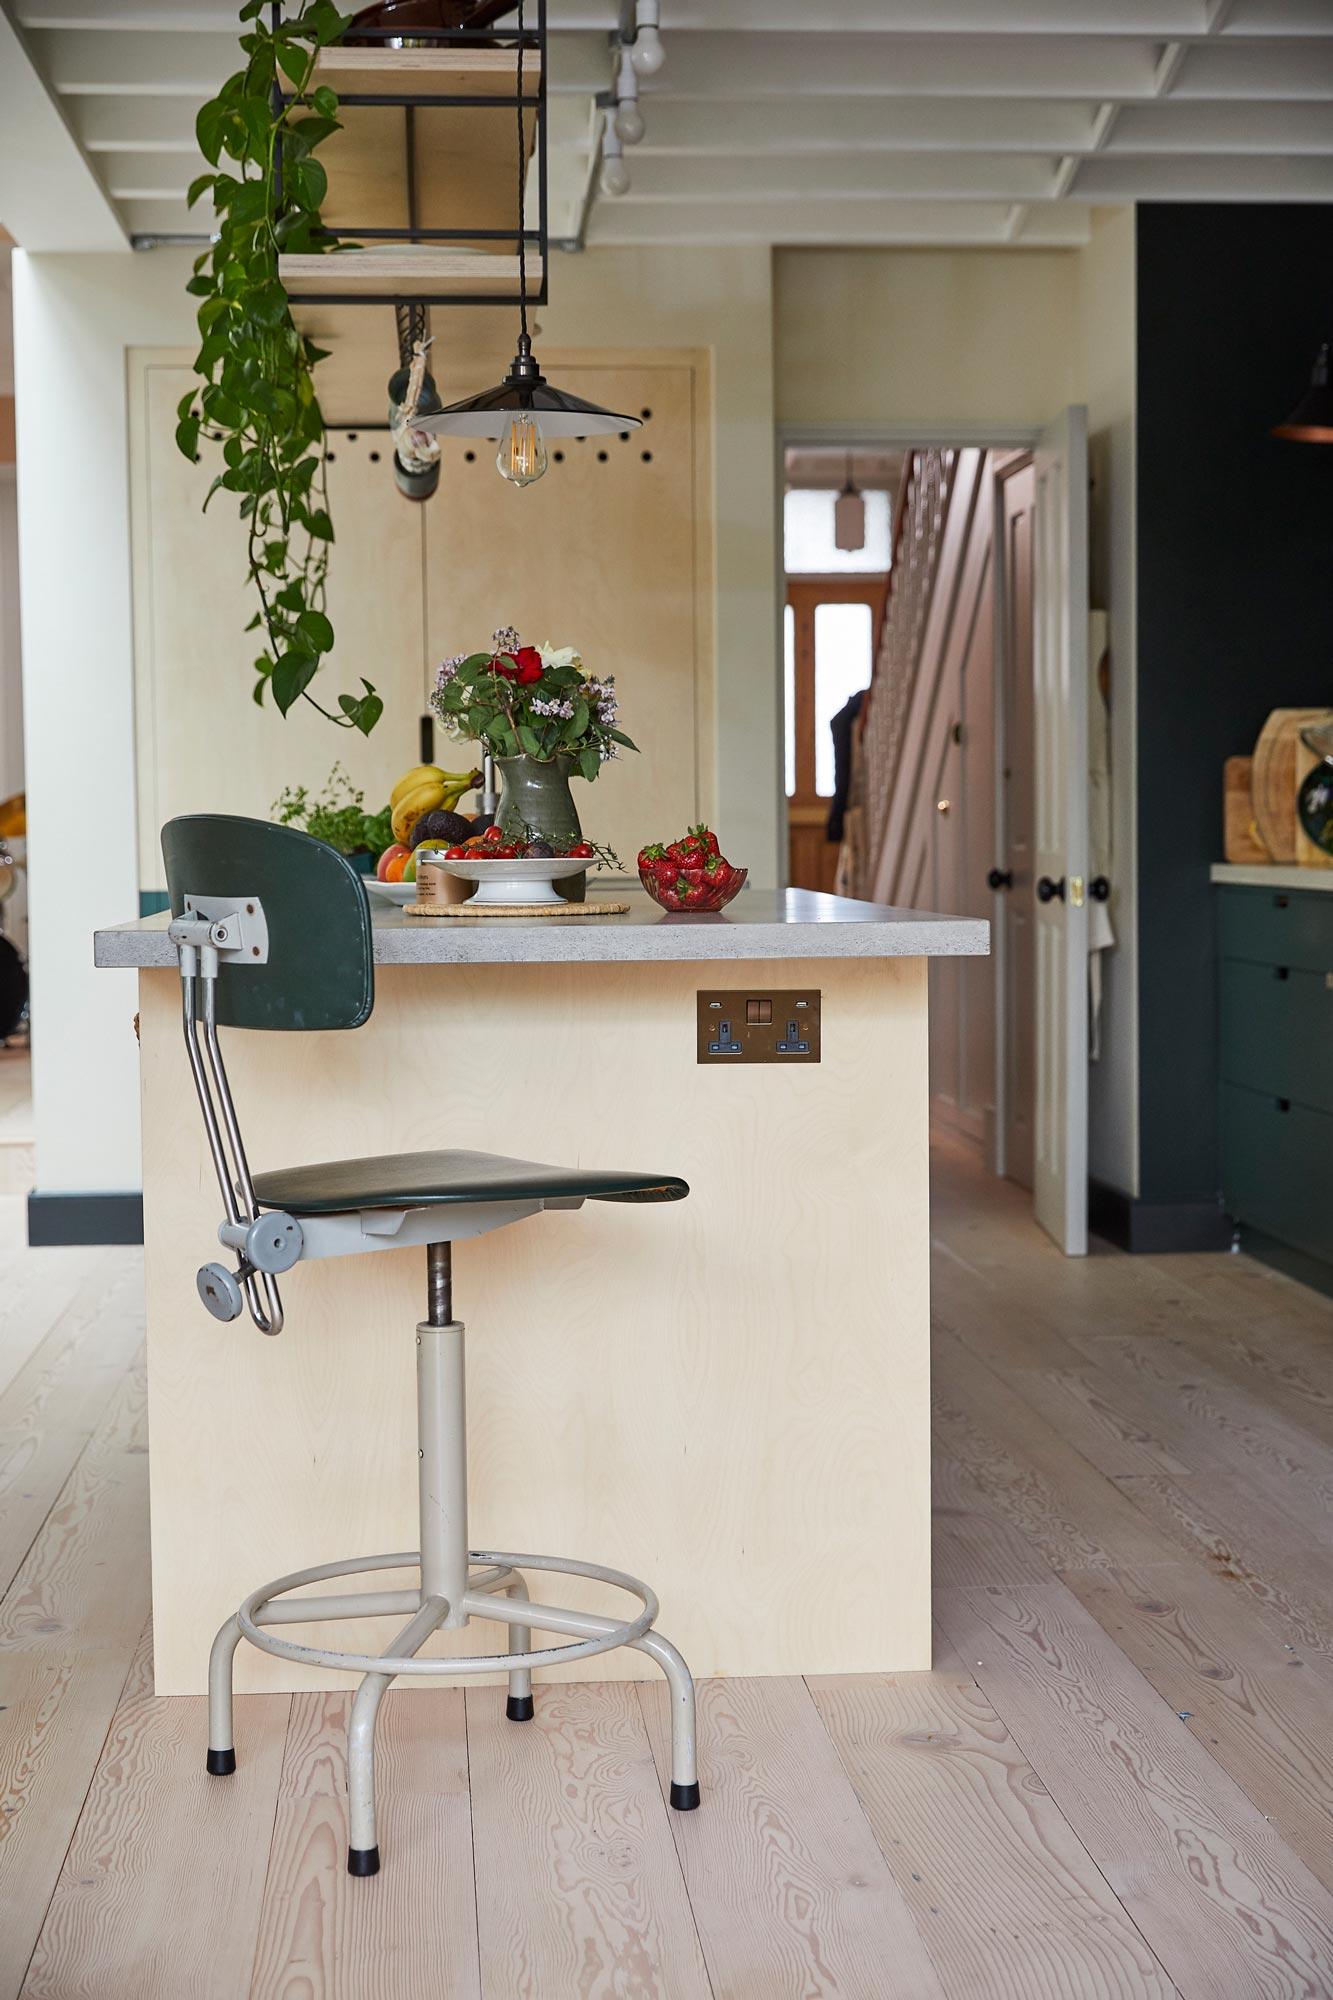 Industrial swivel green barstool under concrete breakfast bar